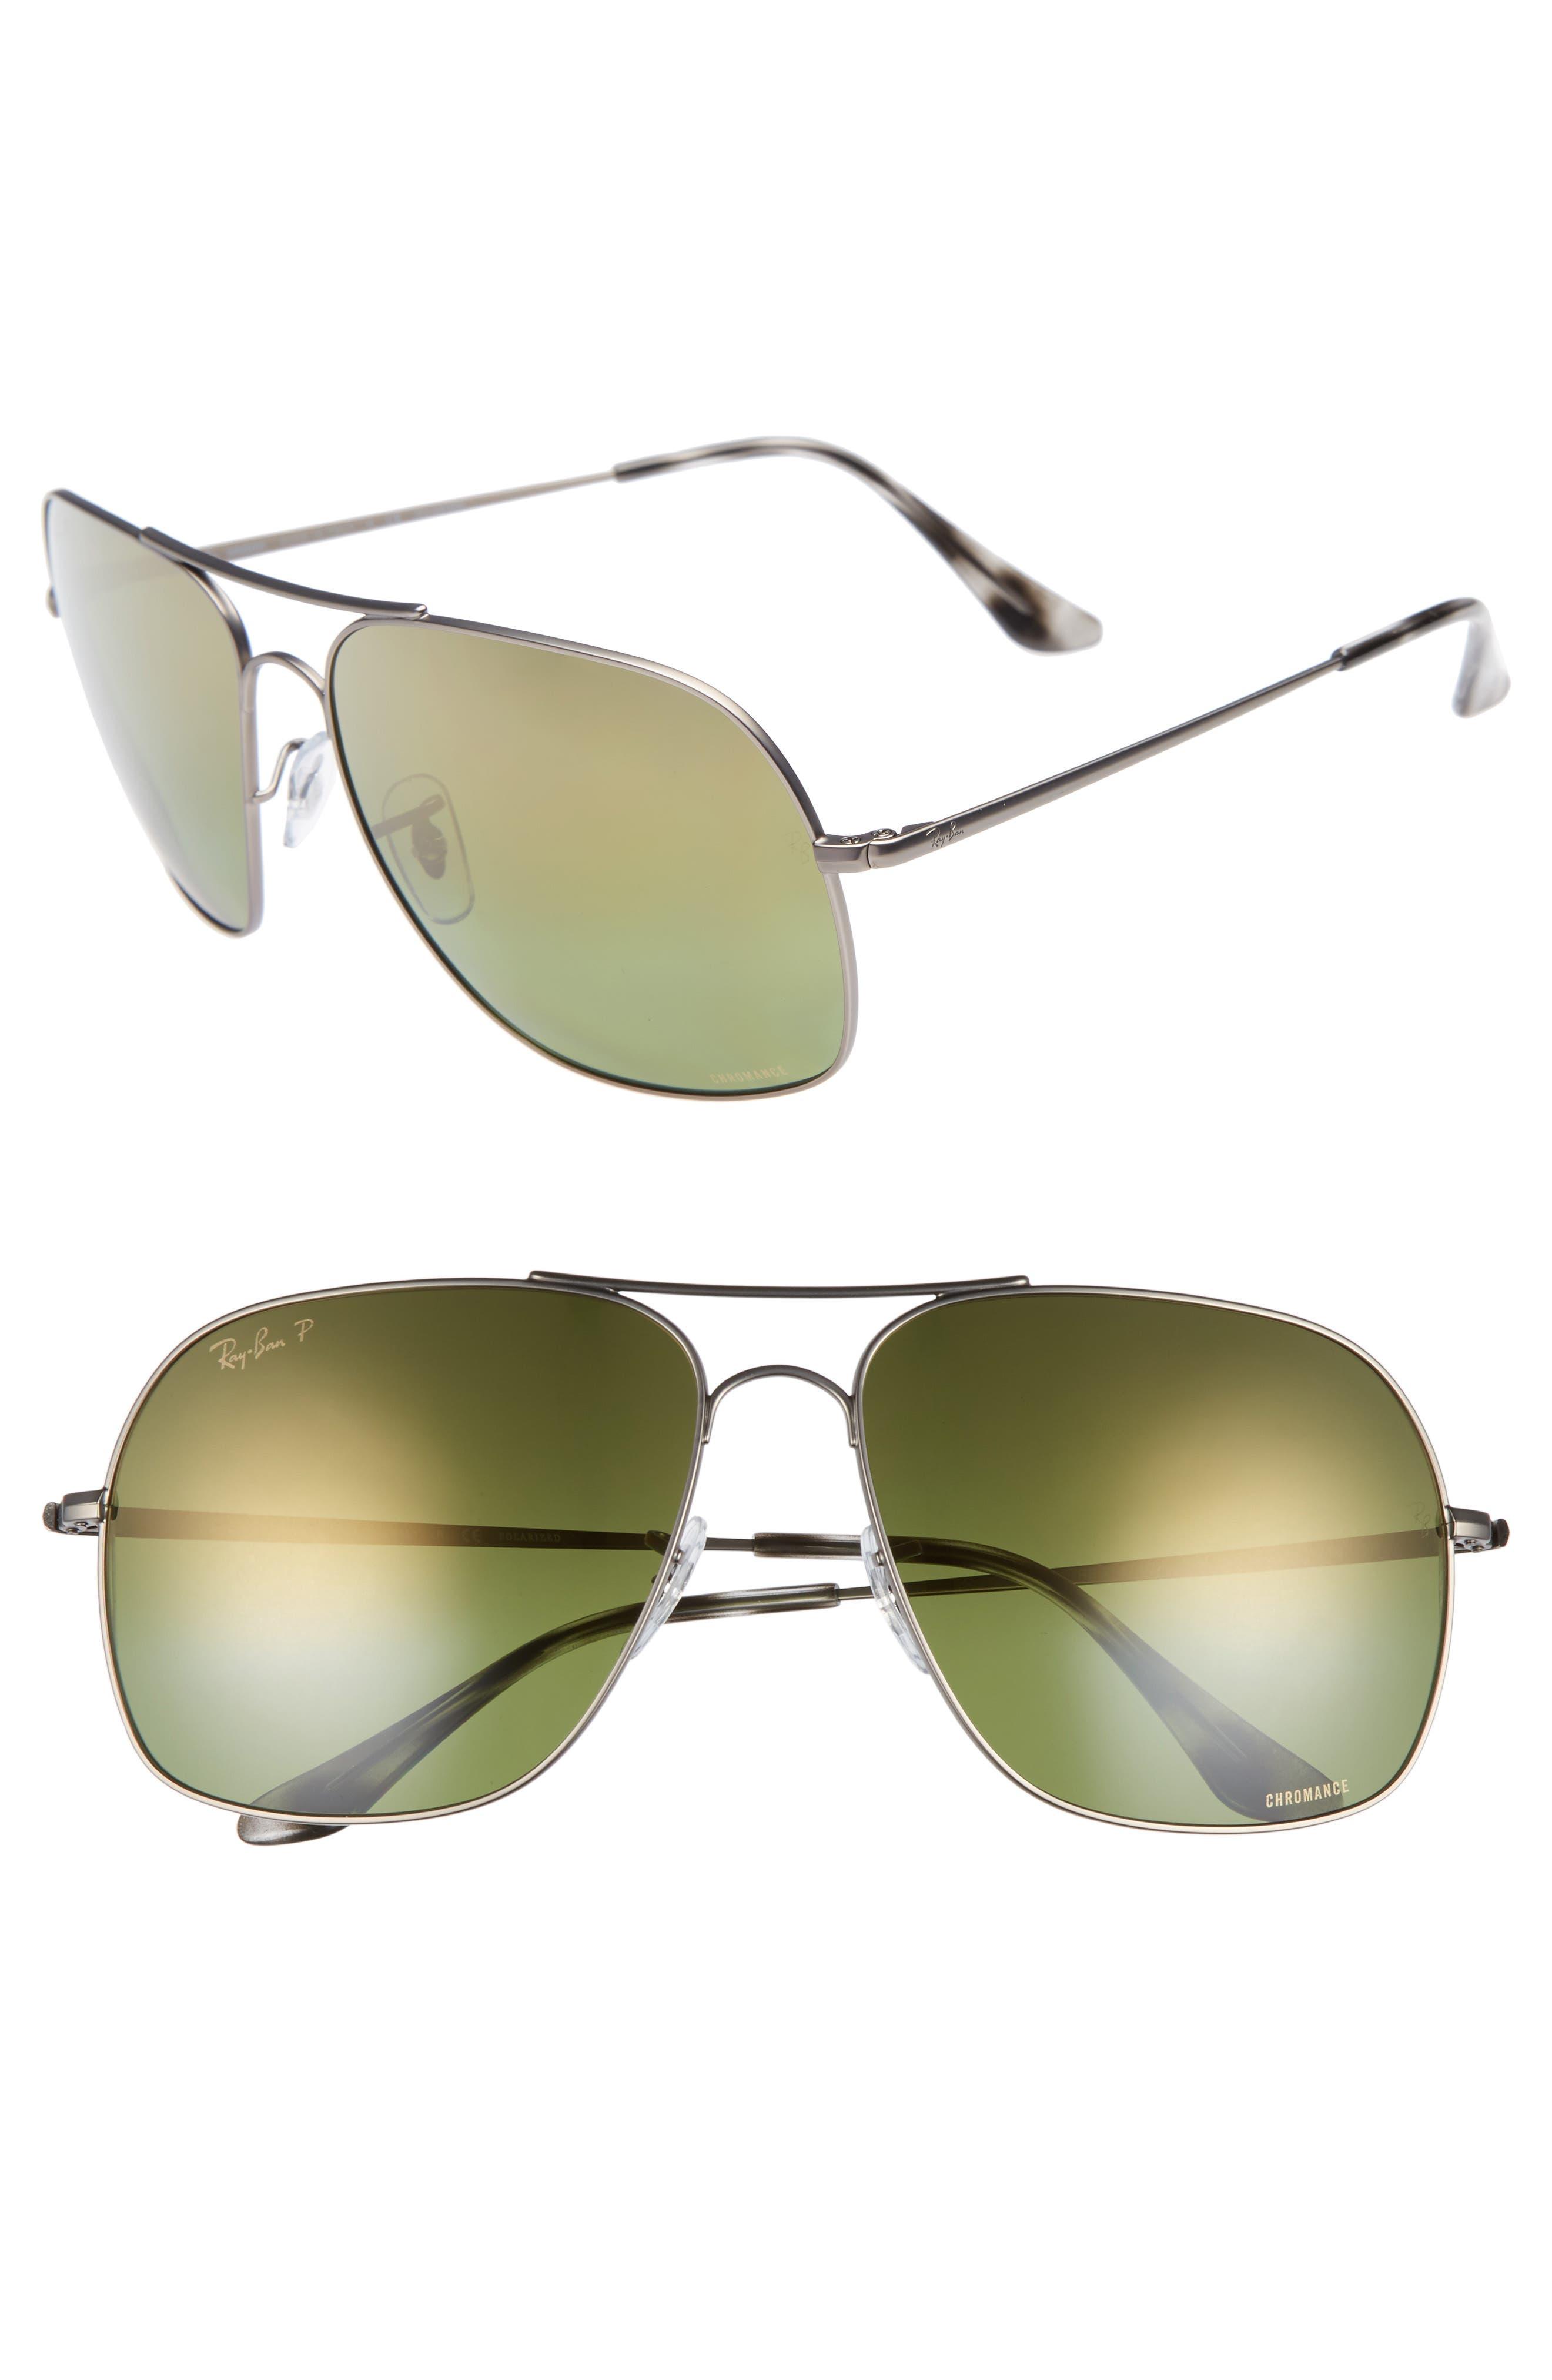 Chromance 61mm Double Bridge Aviator Sunglasses,                             Main thumbnail 1, color,                             Gunmetal/ Green